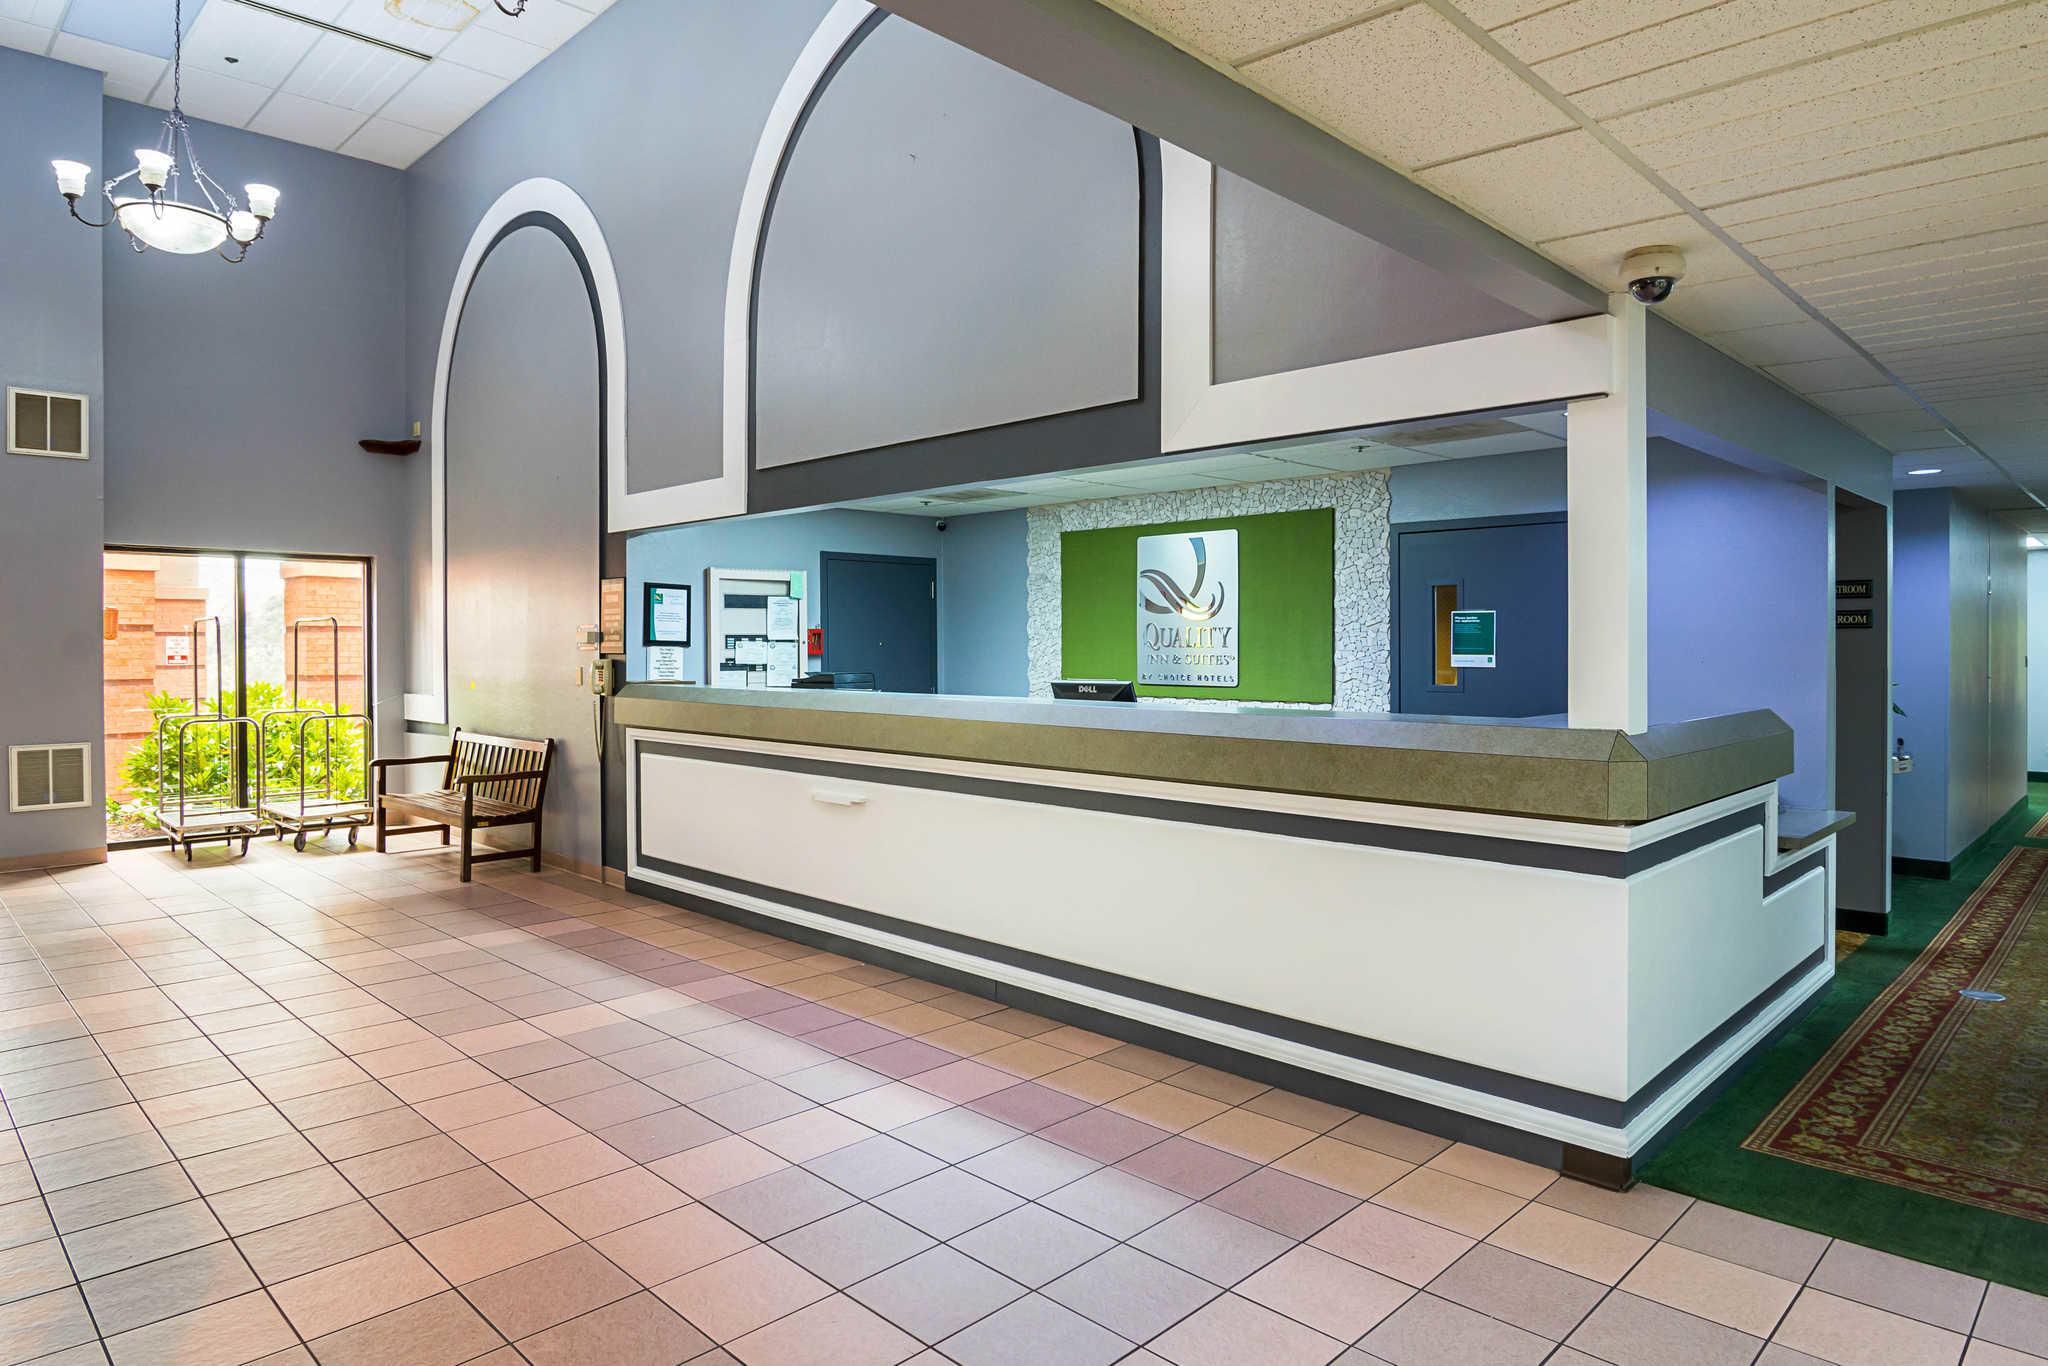 Quality Inn & Suites Kearneysville - Martinsburg image 3